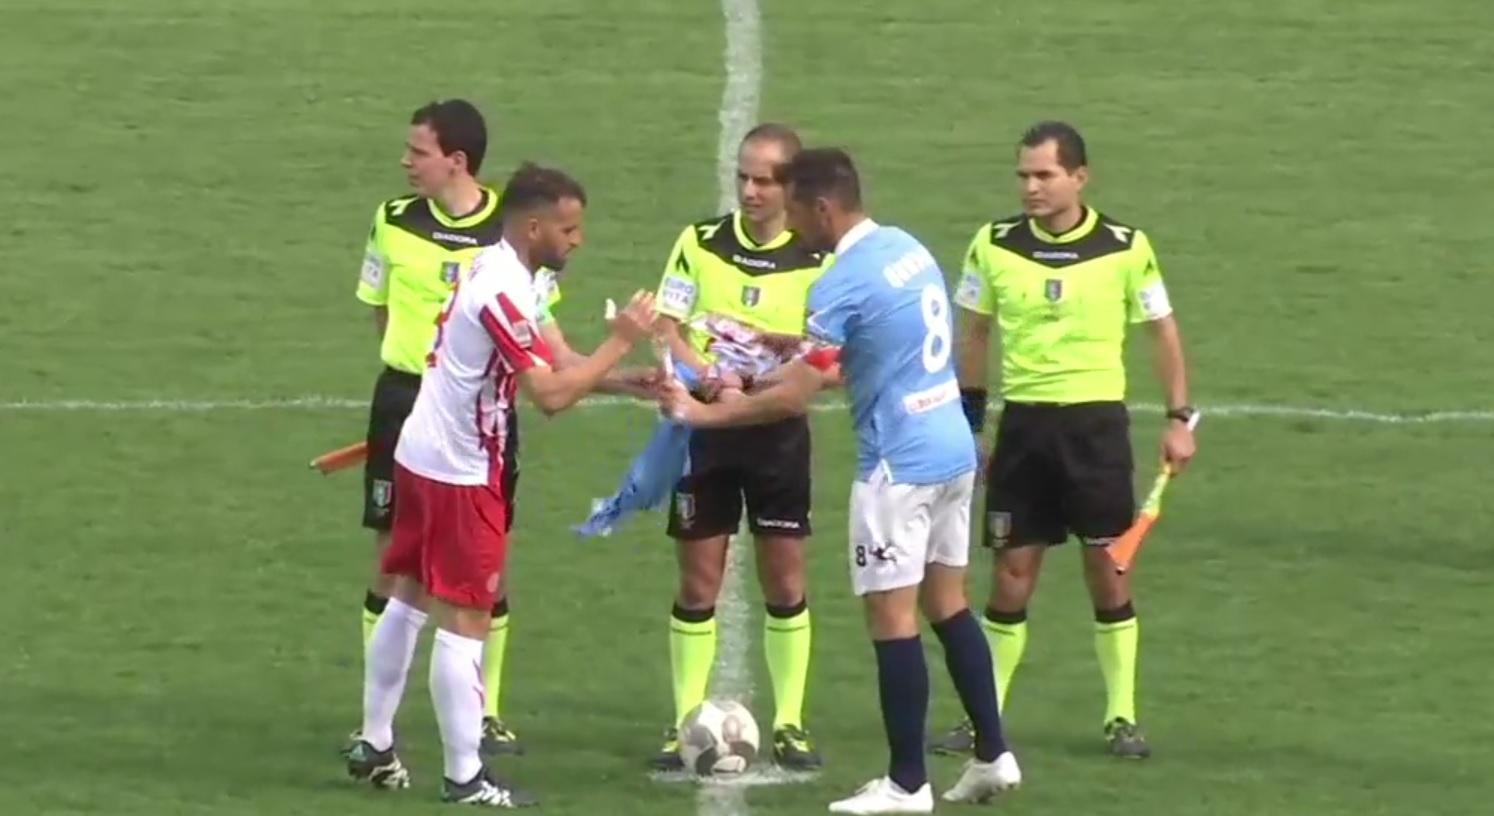 Südtirol-Maceratese 1-0, Rata spuntata e punita da un gran gol di Furlan